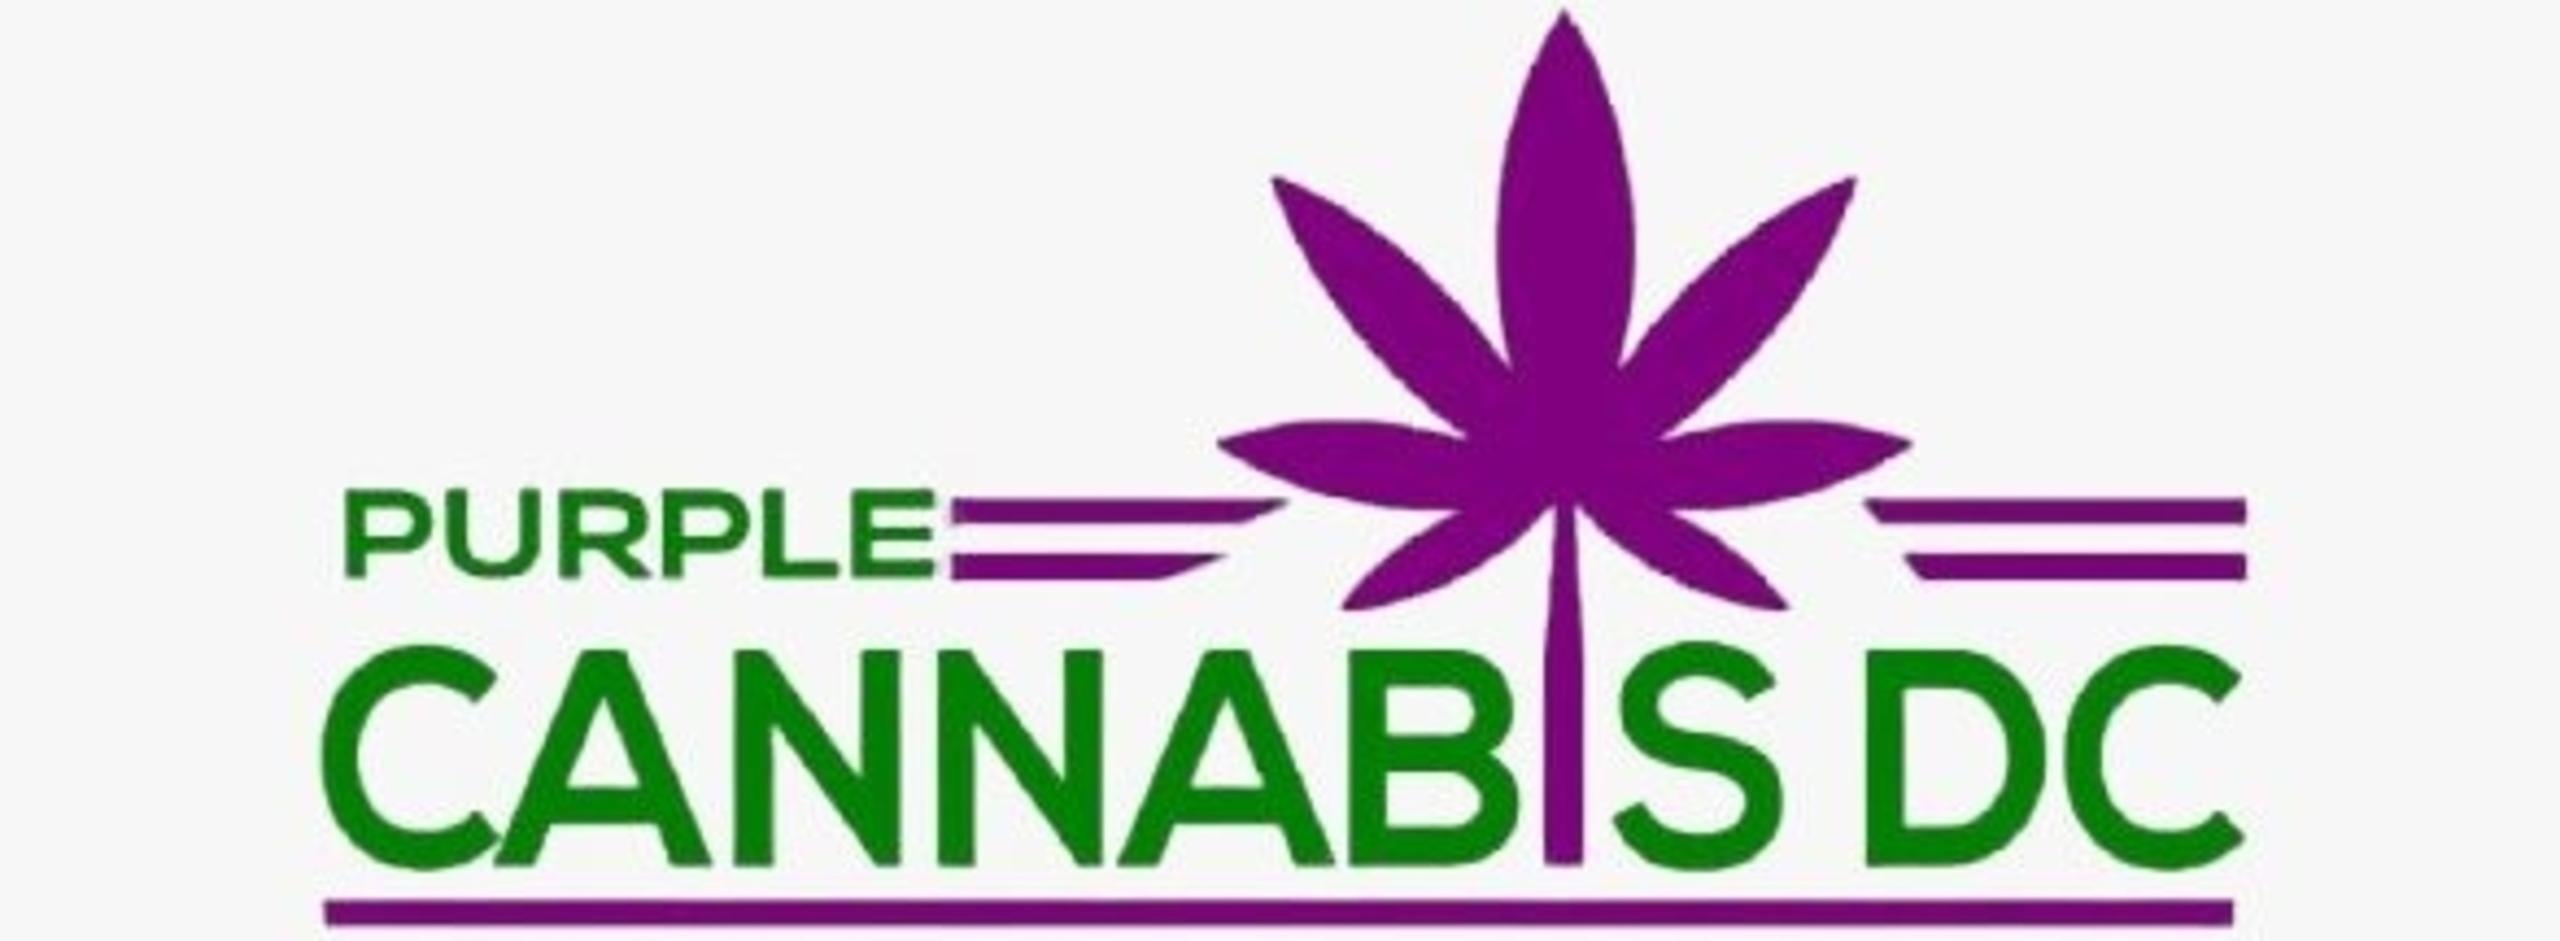 purple cannabis dc (@purplecannabisdc) Cover Image